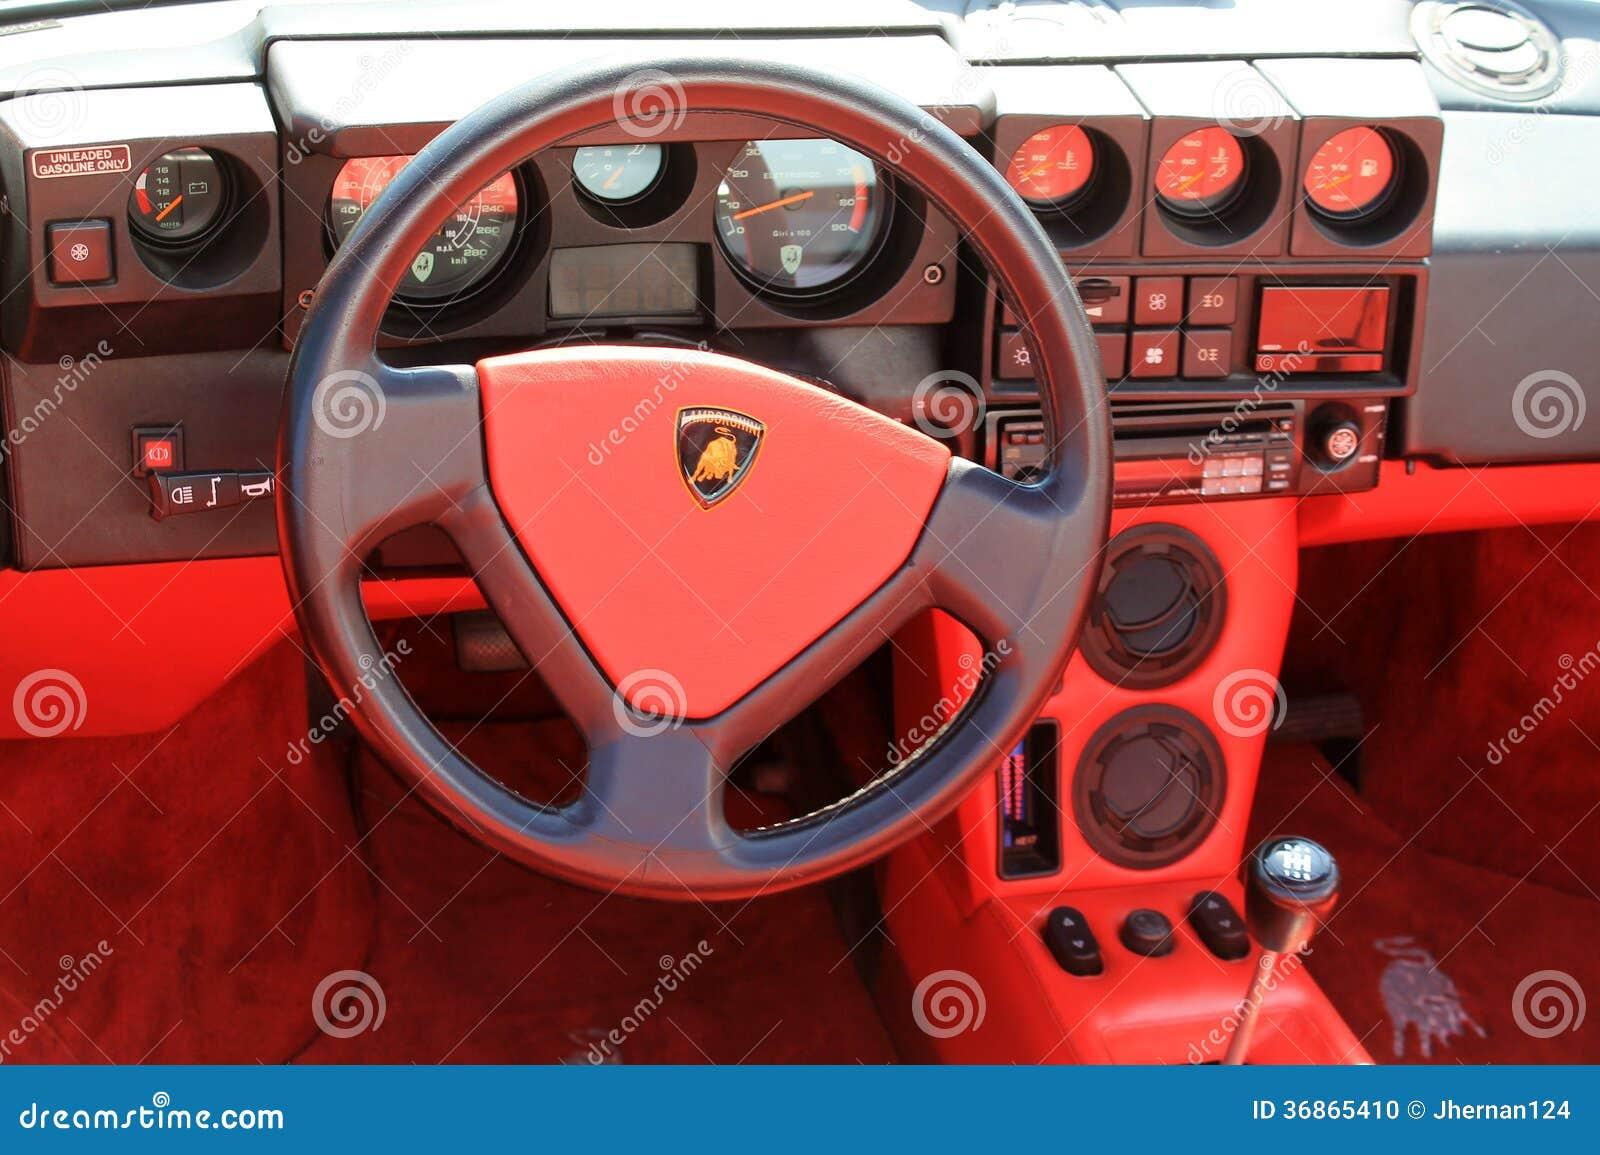 classic lamborghini cockpit interior editorial image 51166822. Black Bedroom Furniture Sets. Home Design Ideas